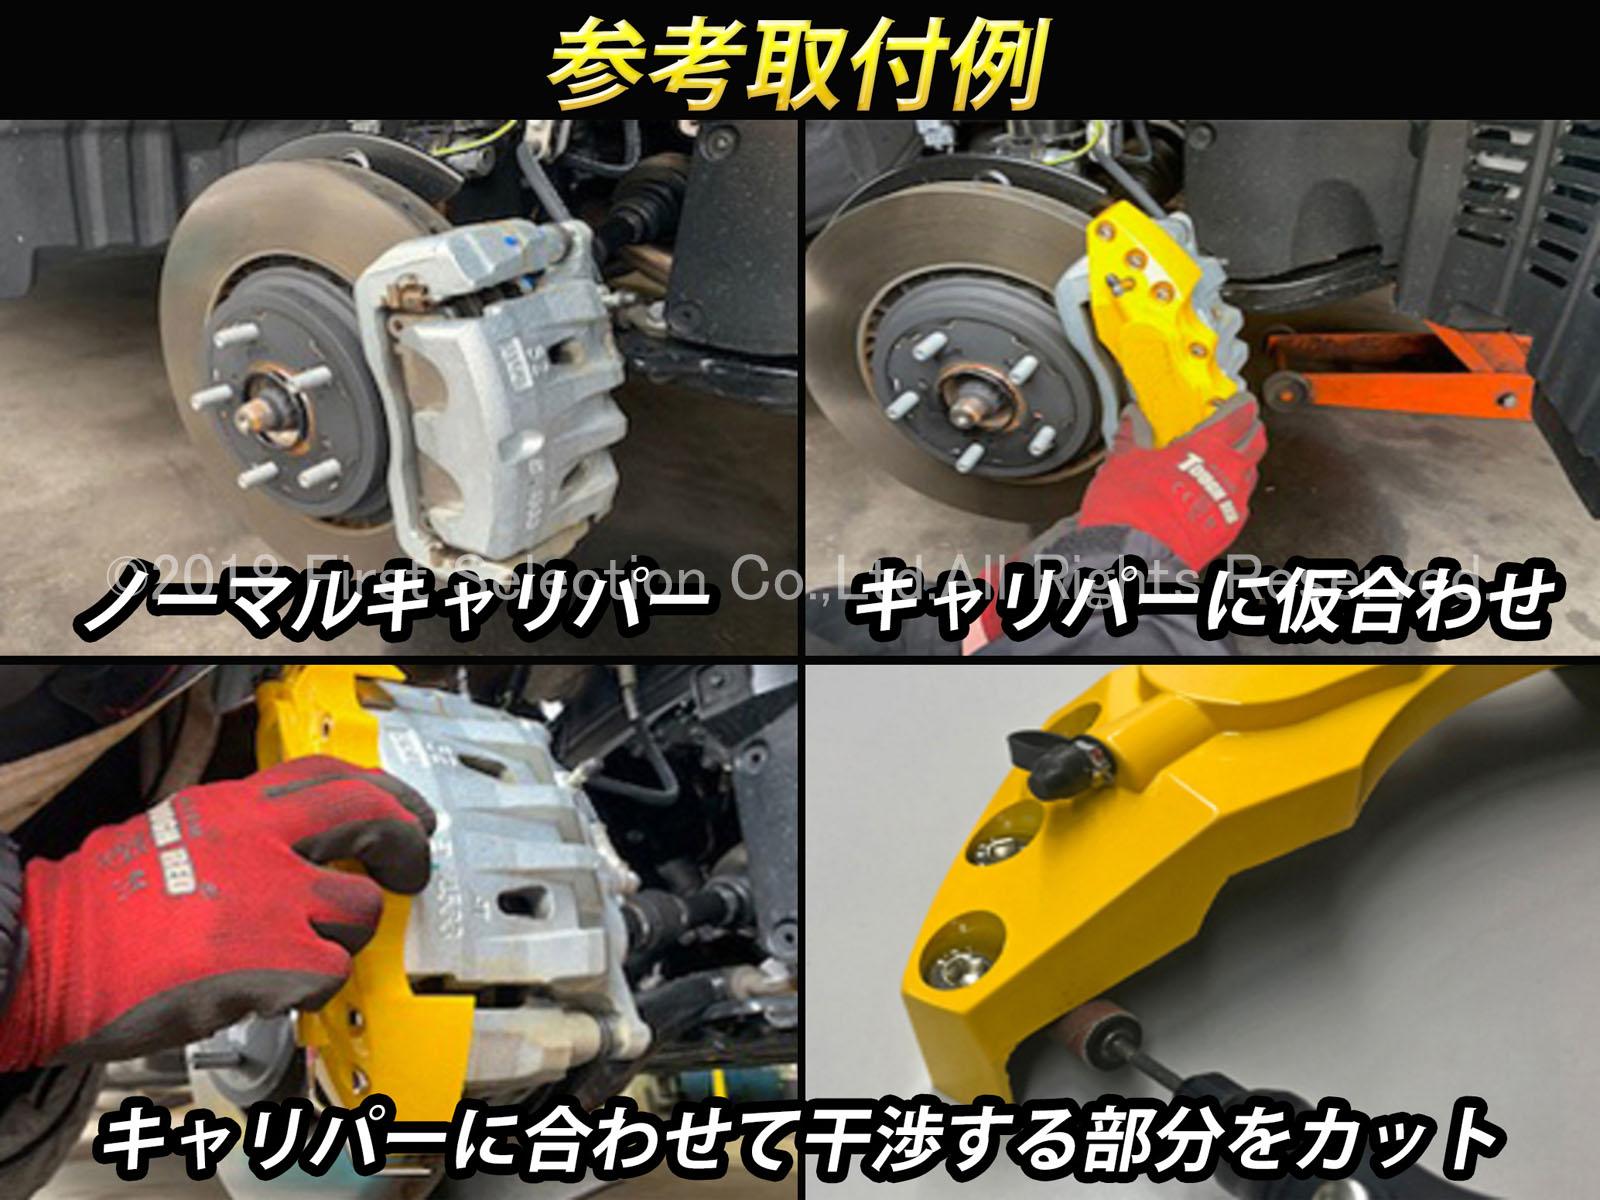 BMW車 ///Mロゴ黒文字 汎用高品質キャリパーカバー黄 L/Mサイズセット